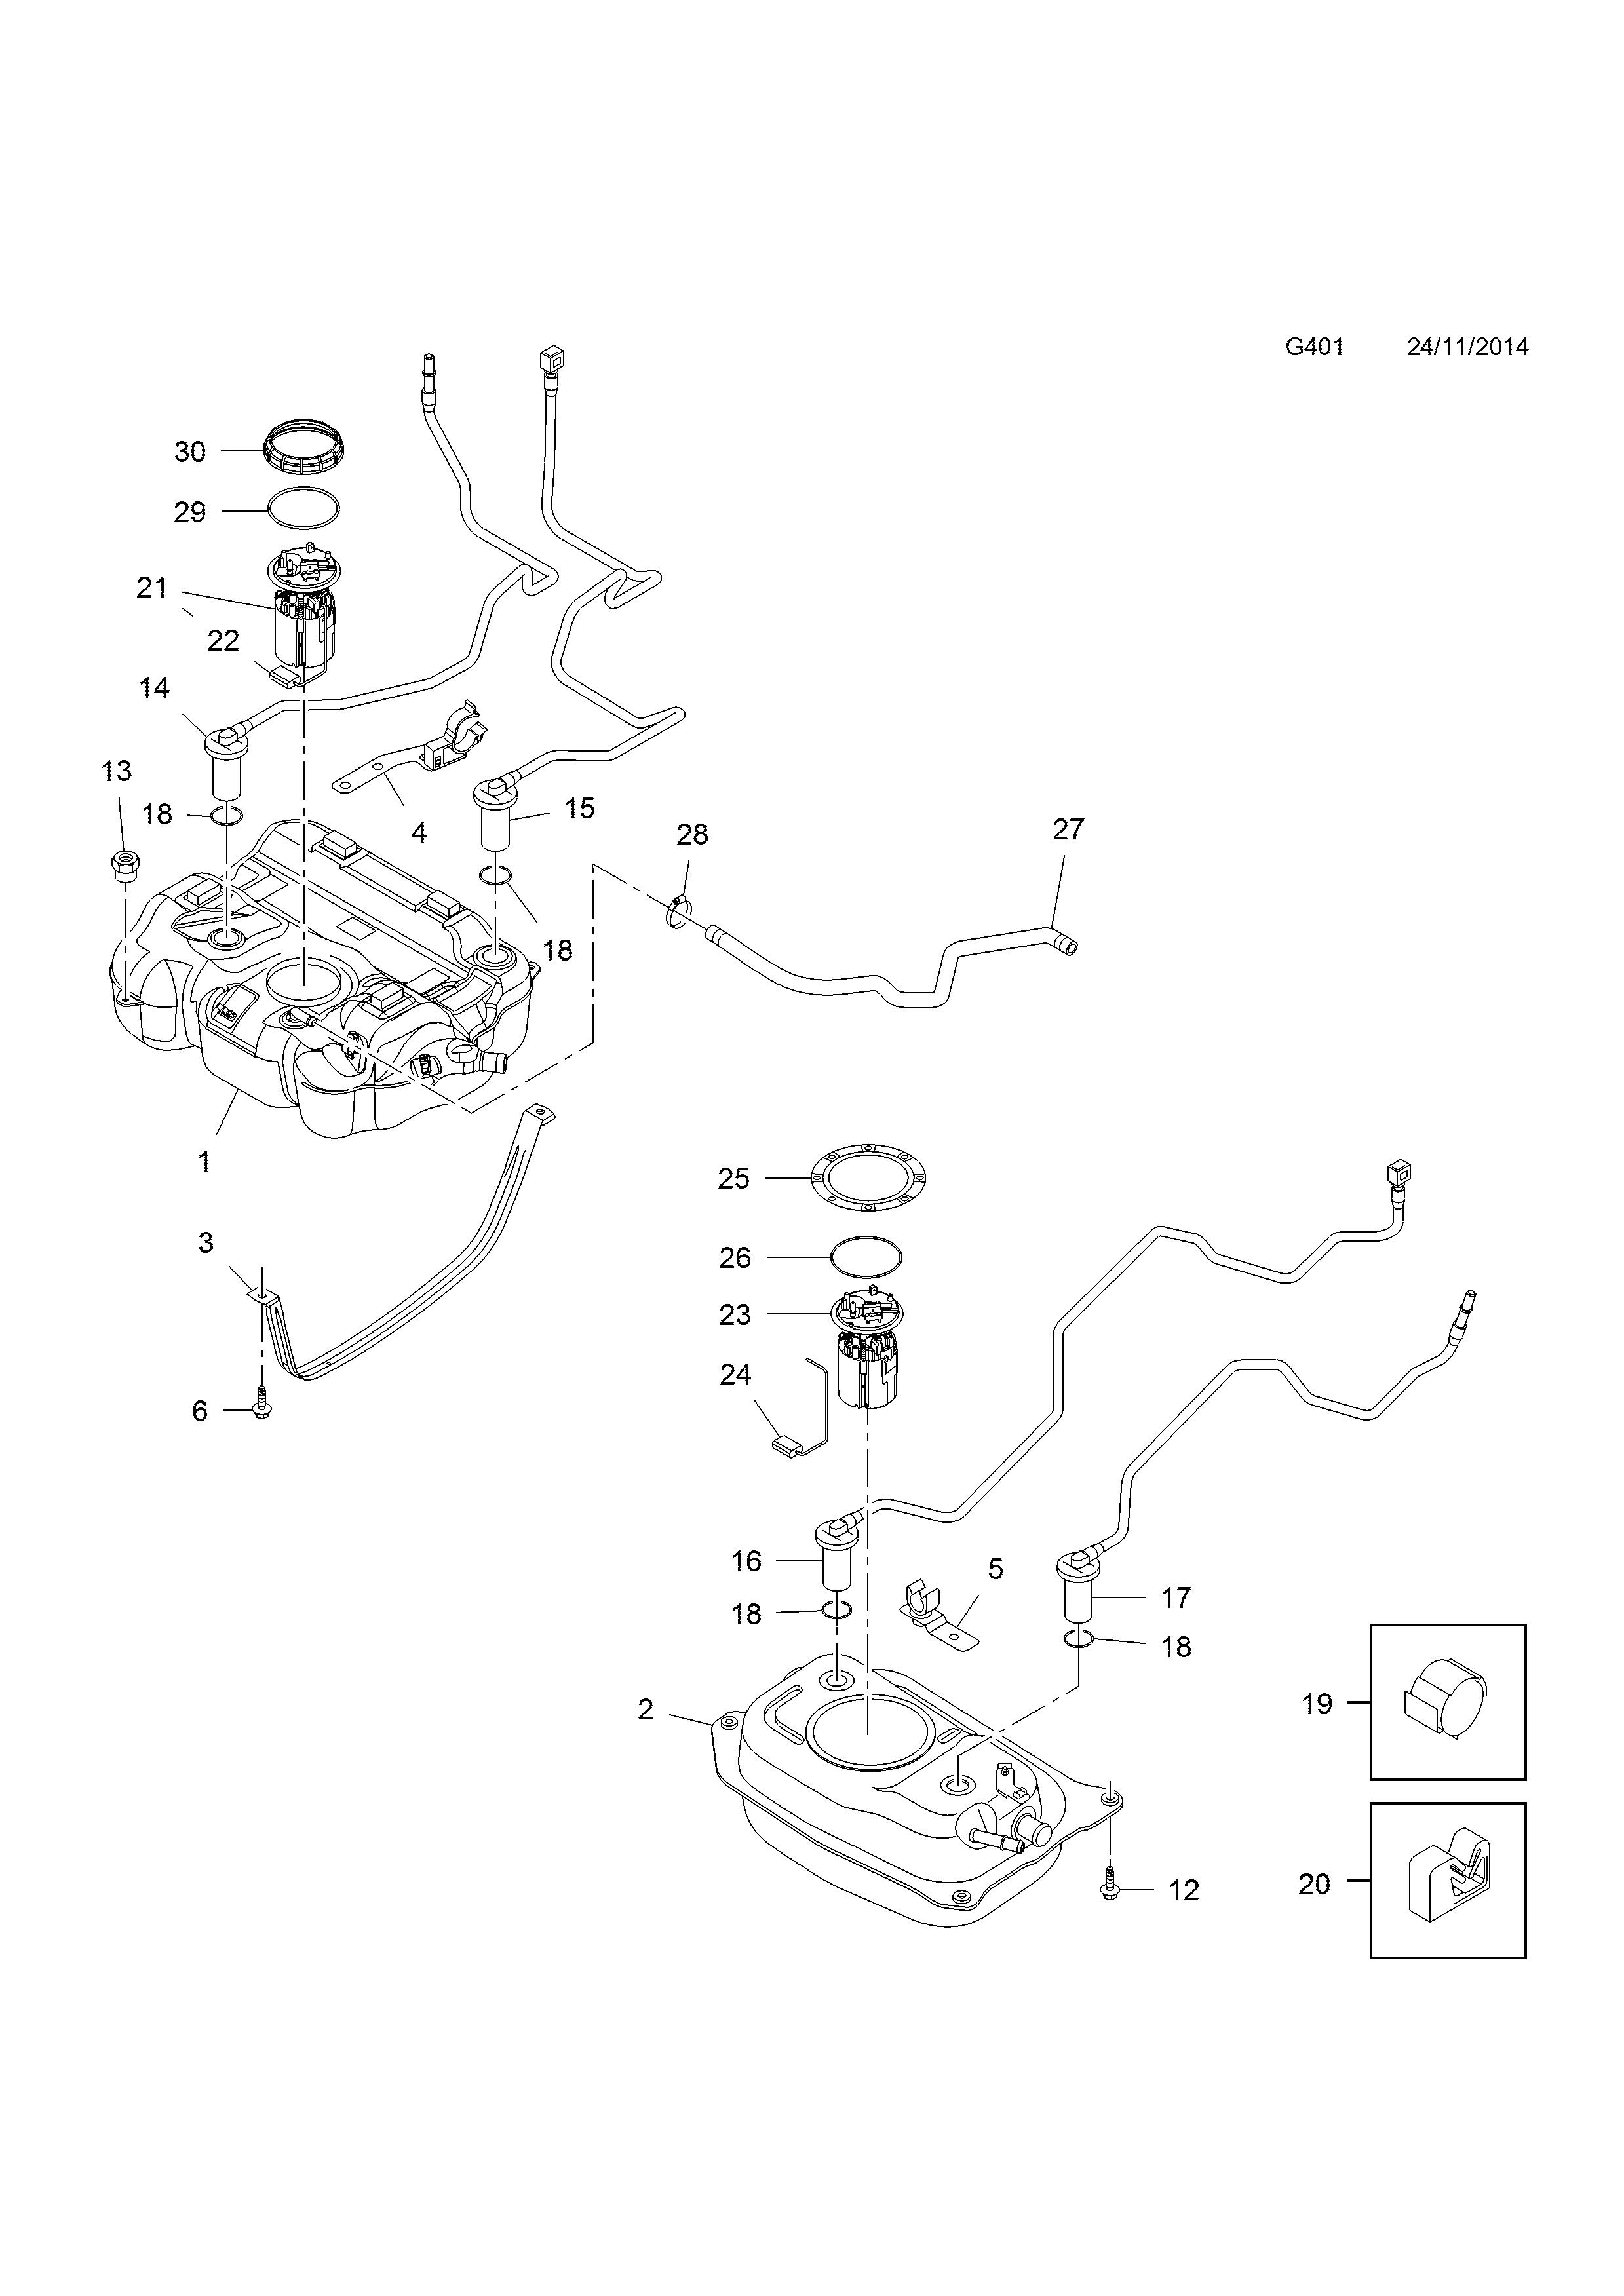 Strange Vauxhall Fuel Pressure Diagram Circuit Diagram Template Wiring Cloud Hisonuggs Outletorg